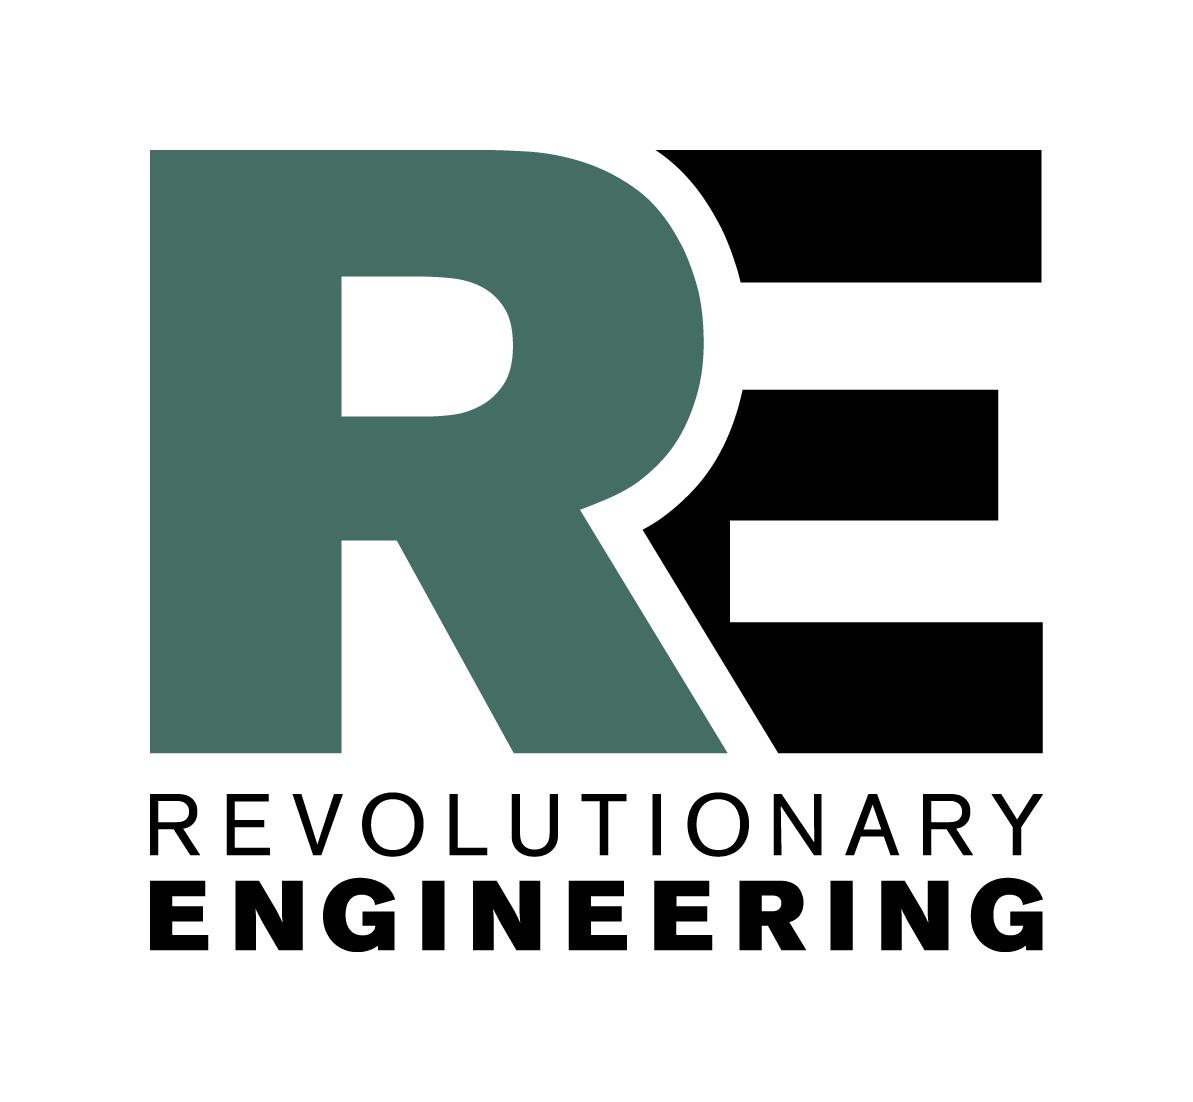 re engineering revolutionary china logos expands operations celebrates ten anniversary